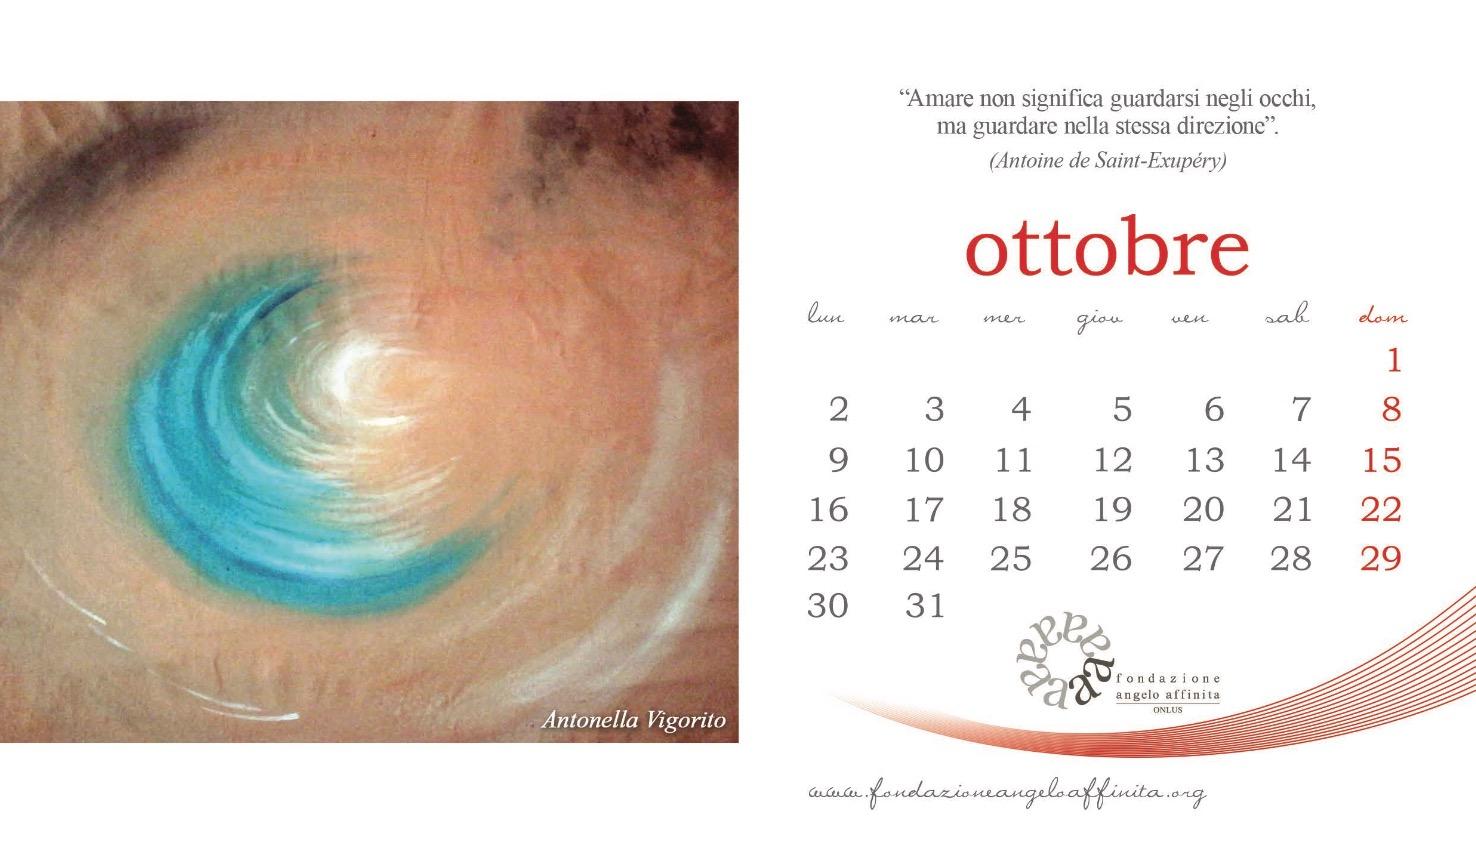 calendario-2017-fondazione-angelo-affinita_11